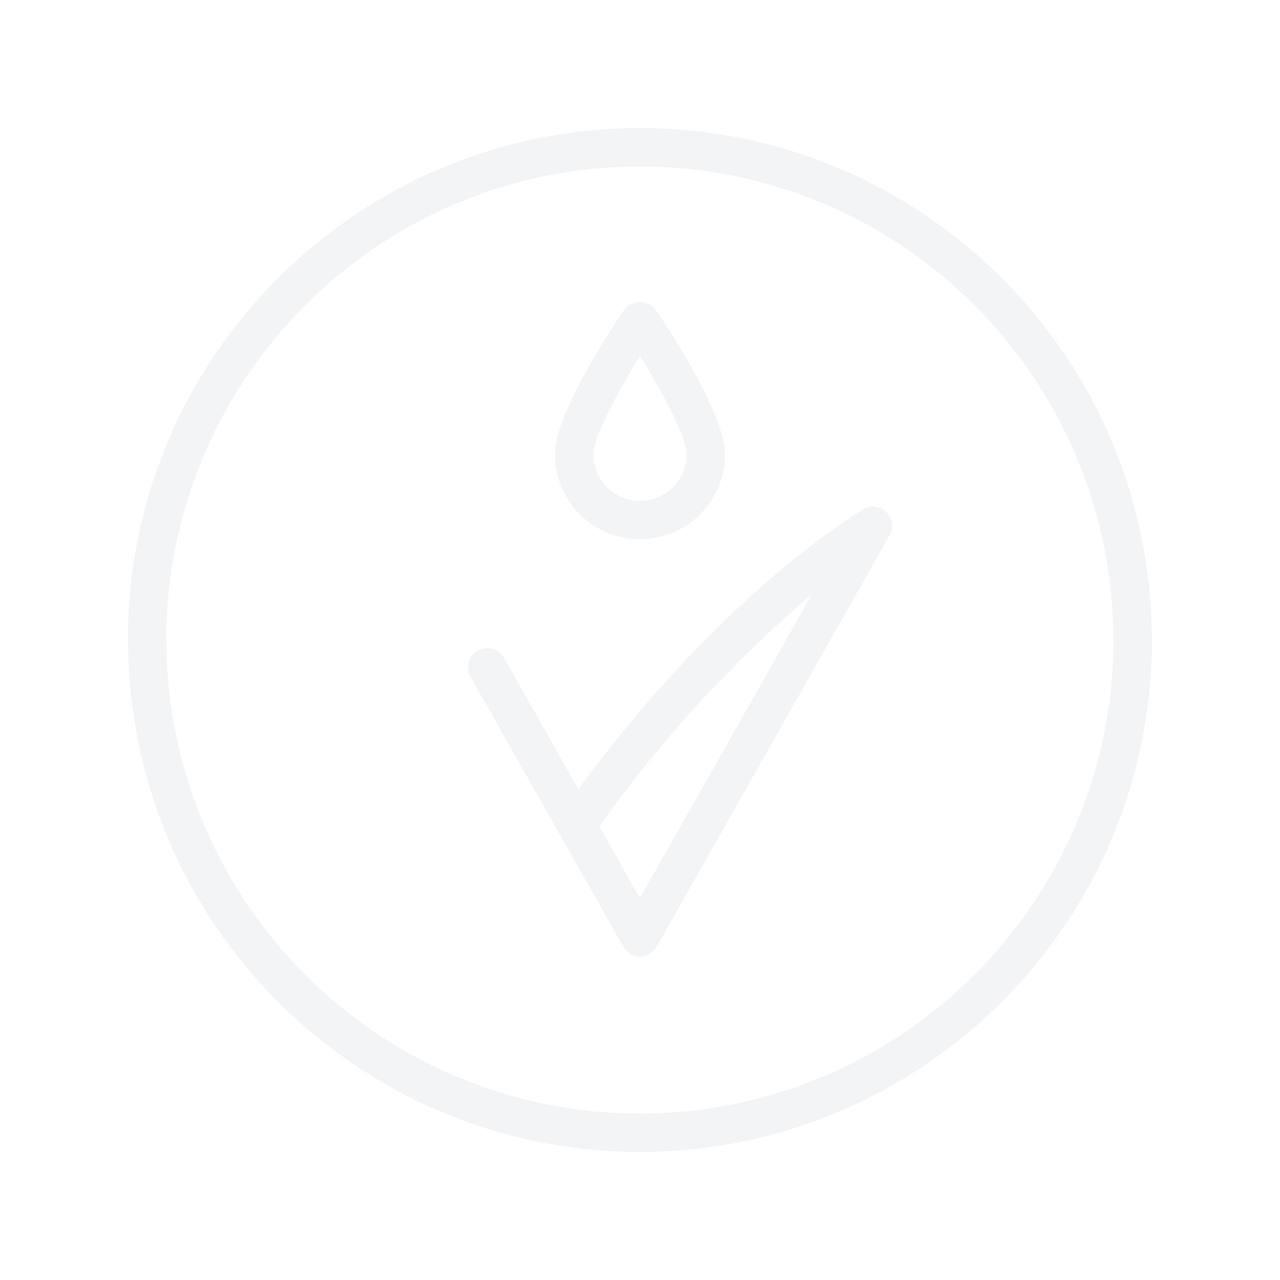 E.L.F. Precision Liquid Eyeliner Black 3.5ml